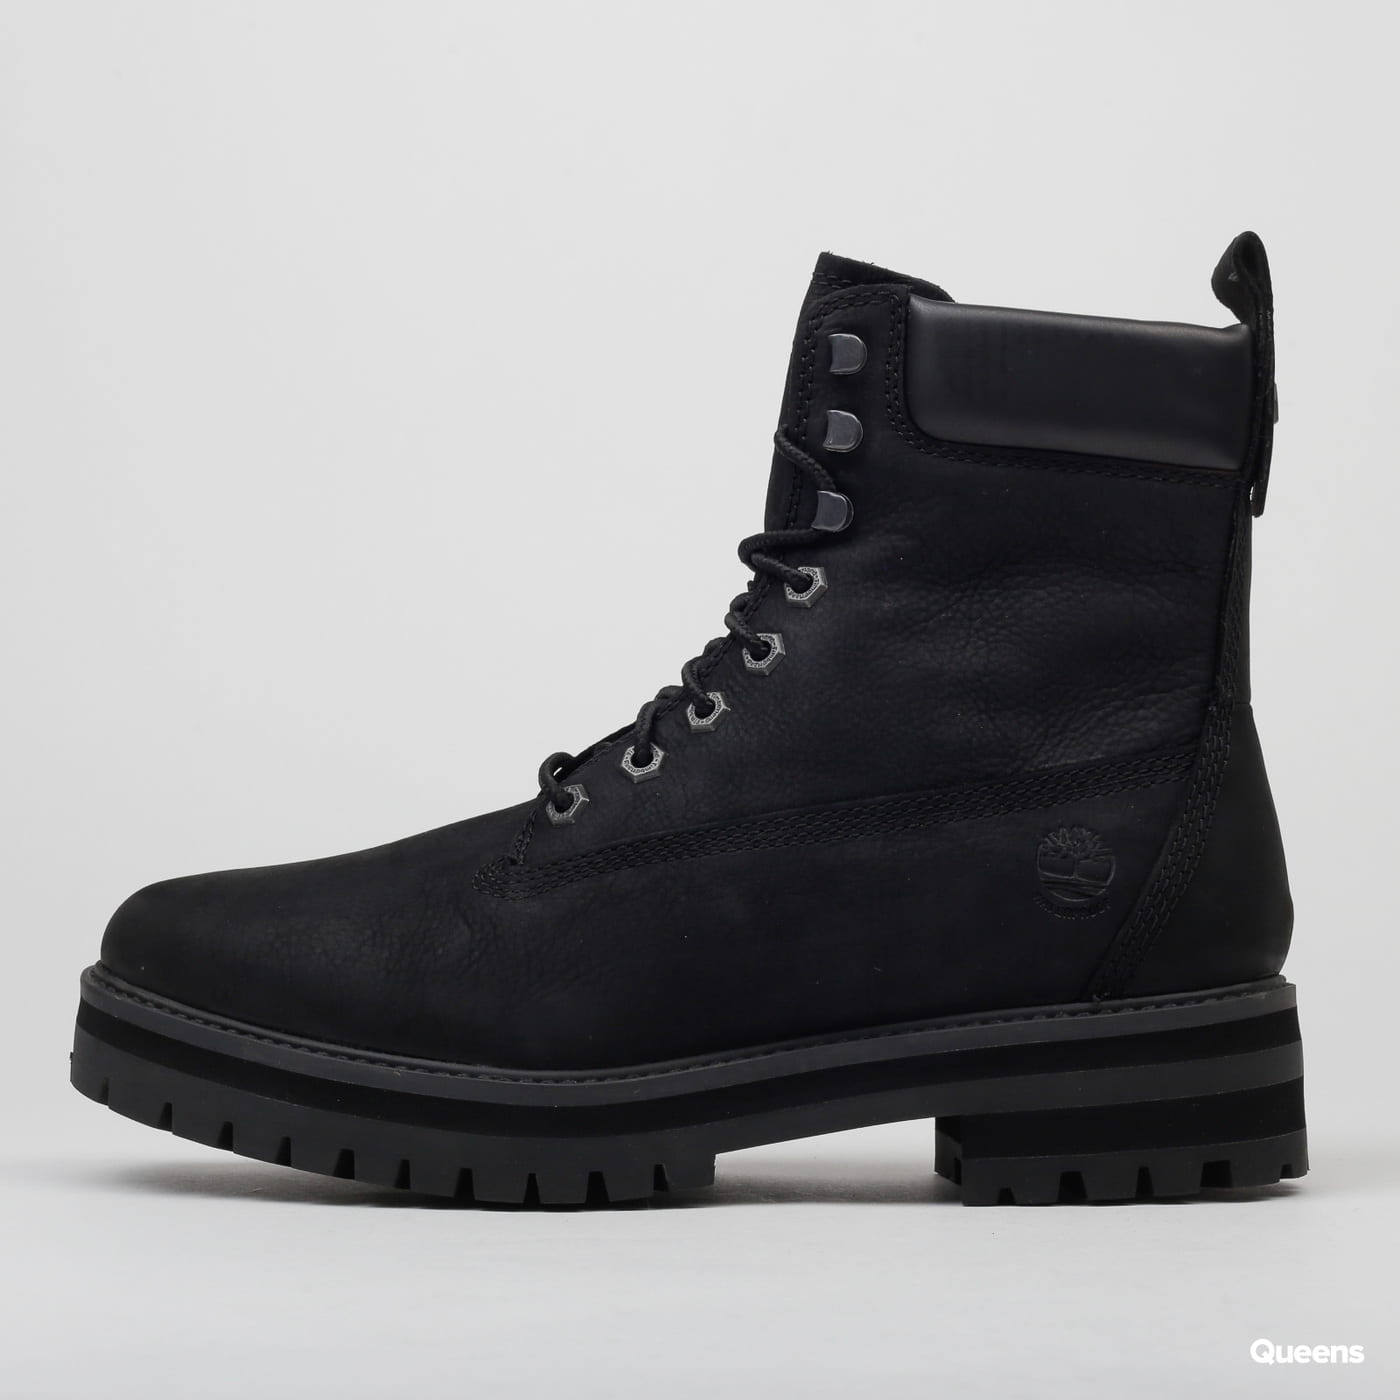 Timberland Courma Guy Waterproof Boot black full grain